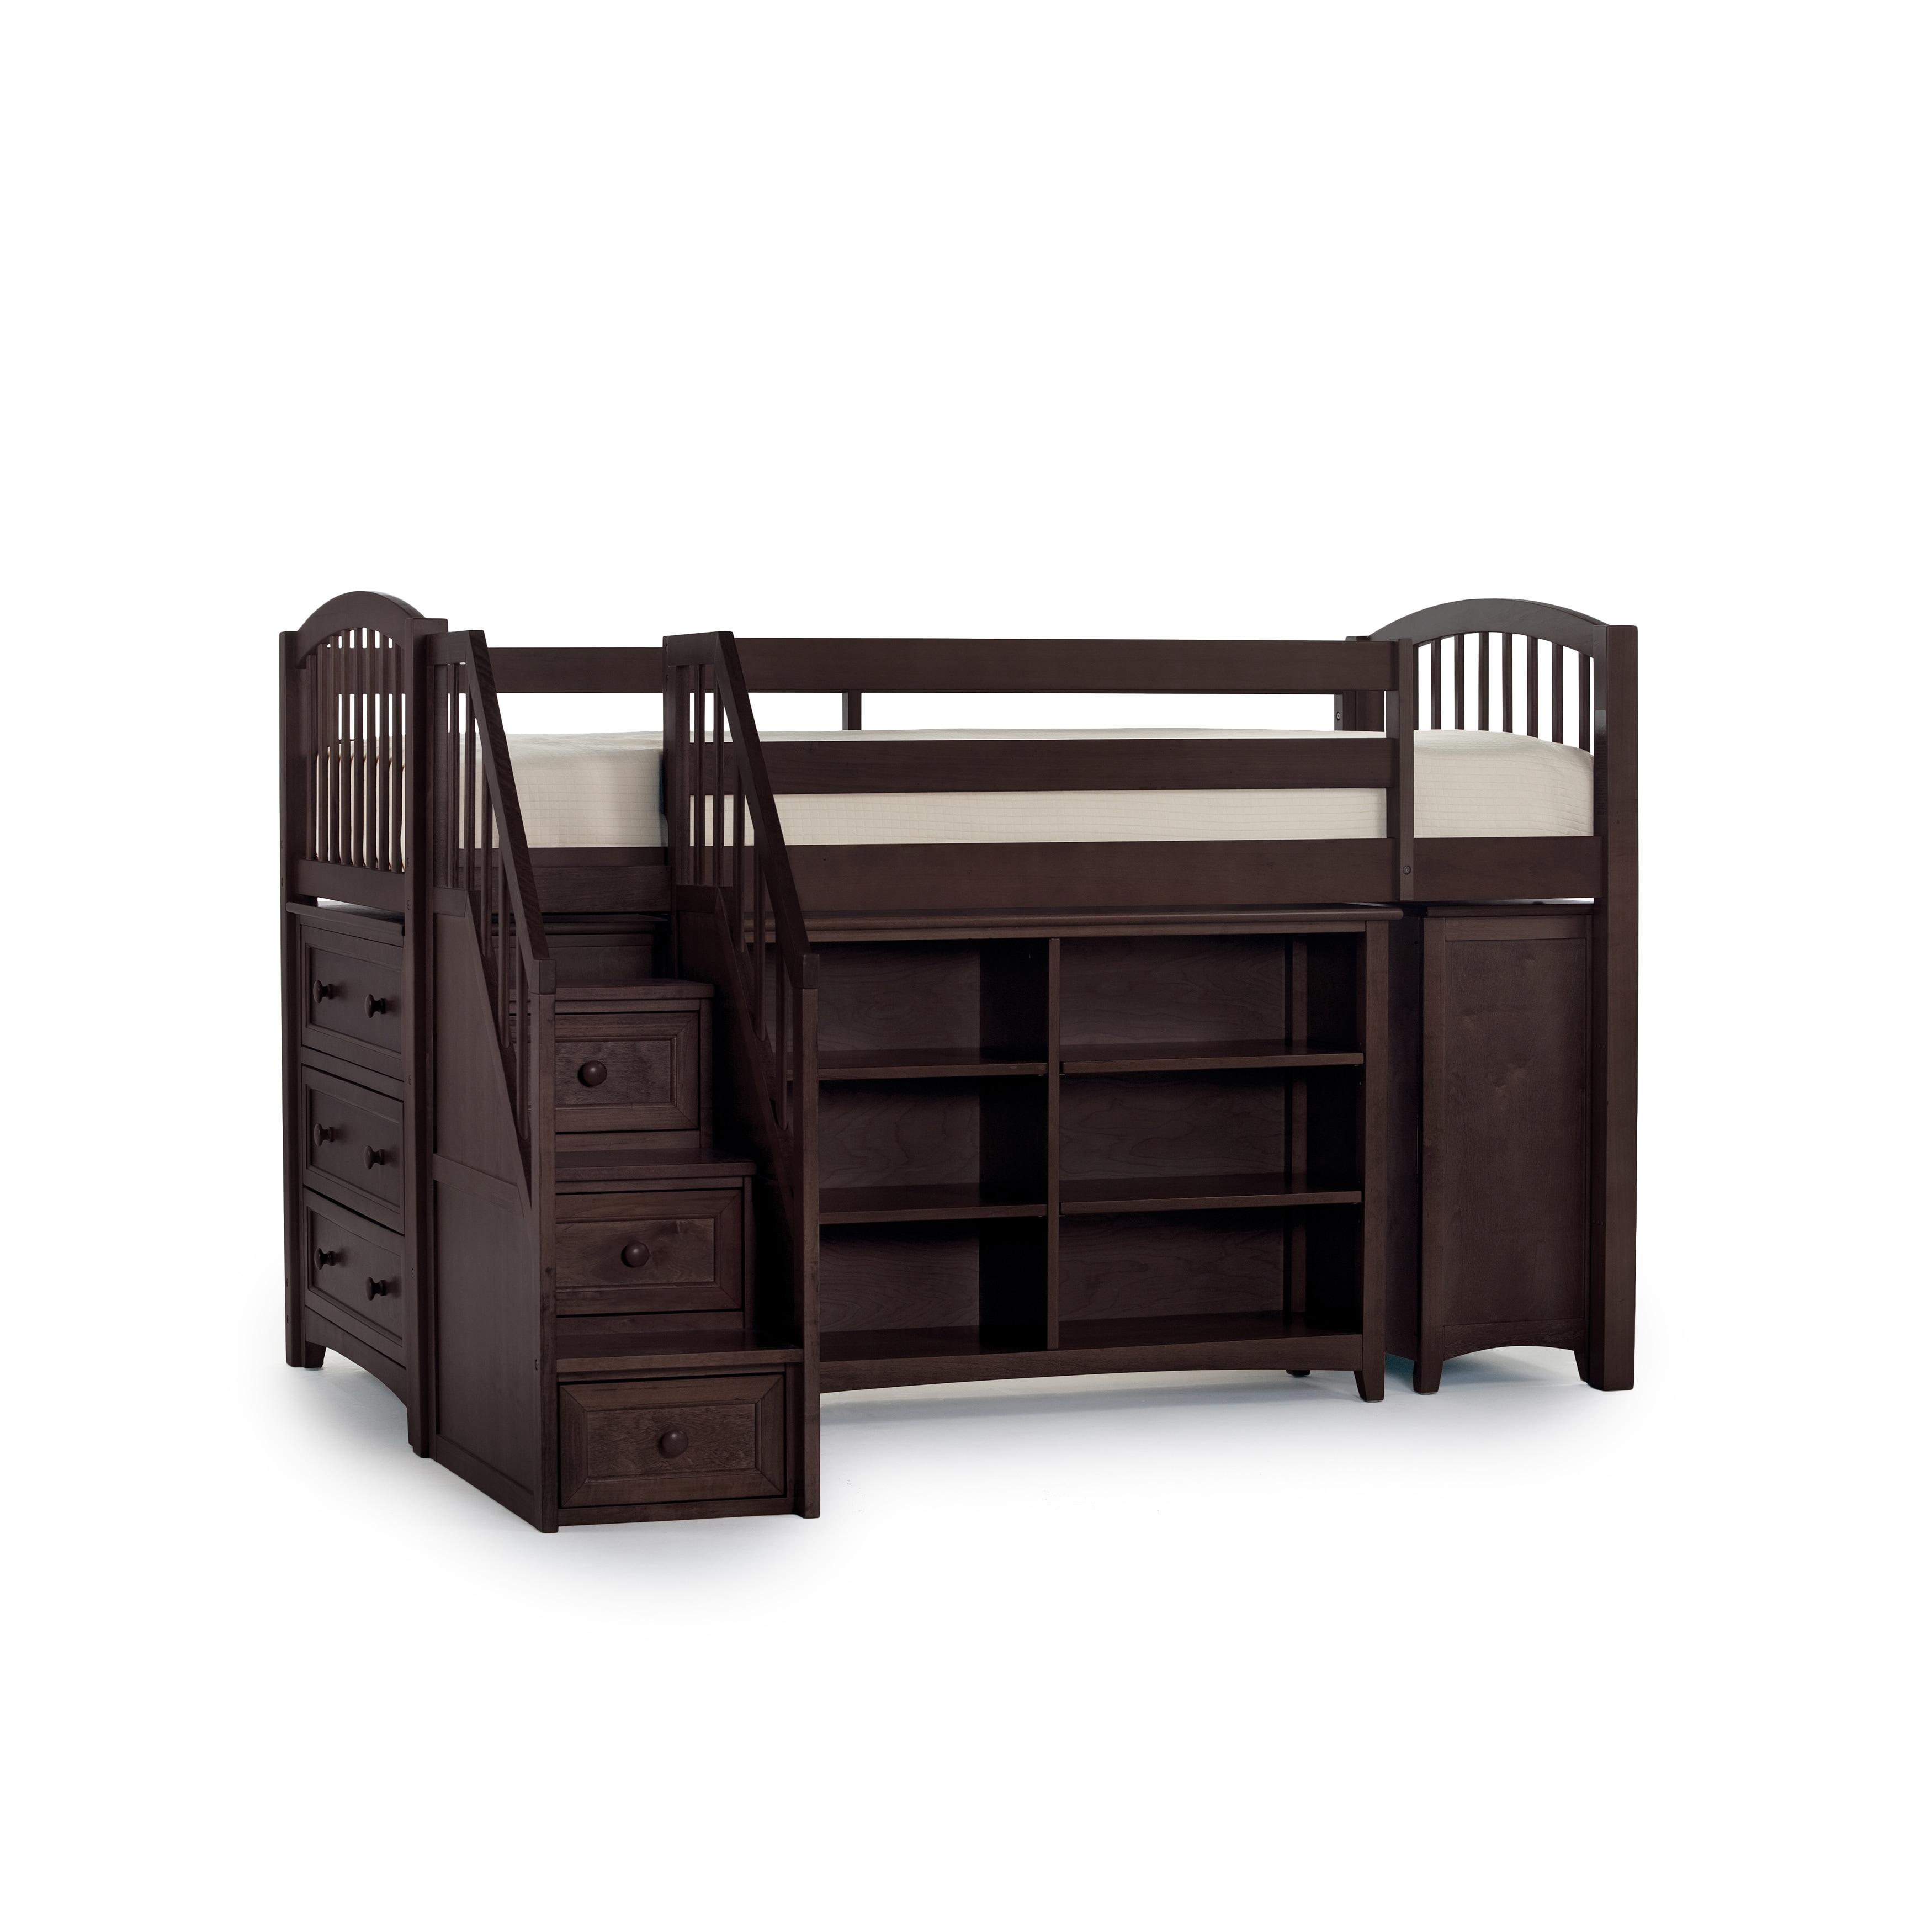 NE Kids School House Junior Chocolate Loft Bed with Stora...